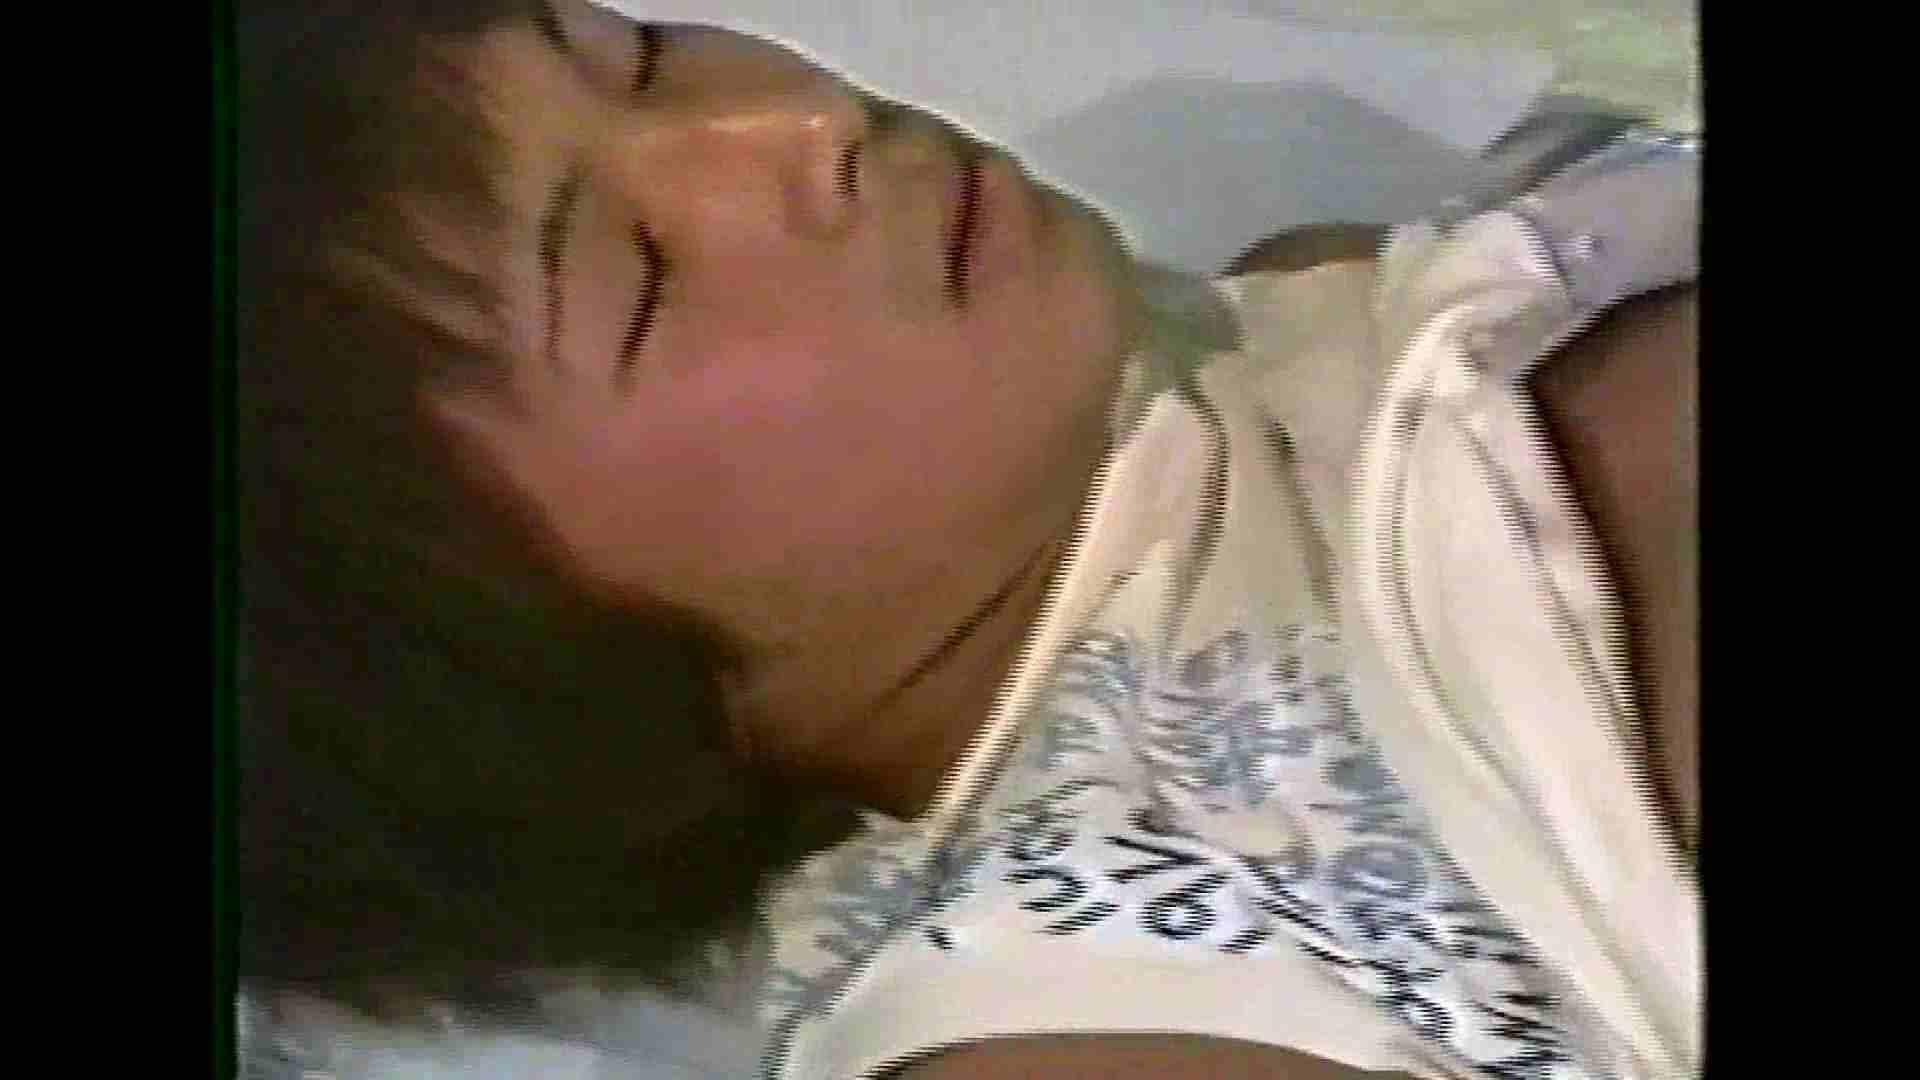 MADOKAさんのズリネタコレクションVol.3-1 名作・話題作 | オムニバス  101pic 14